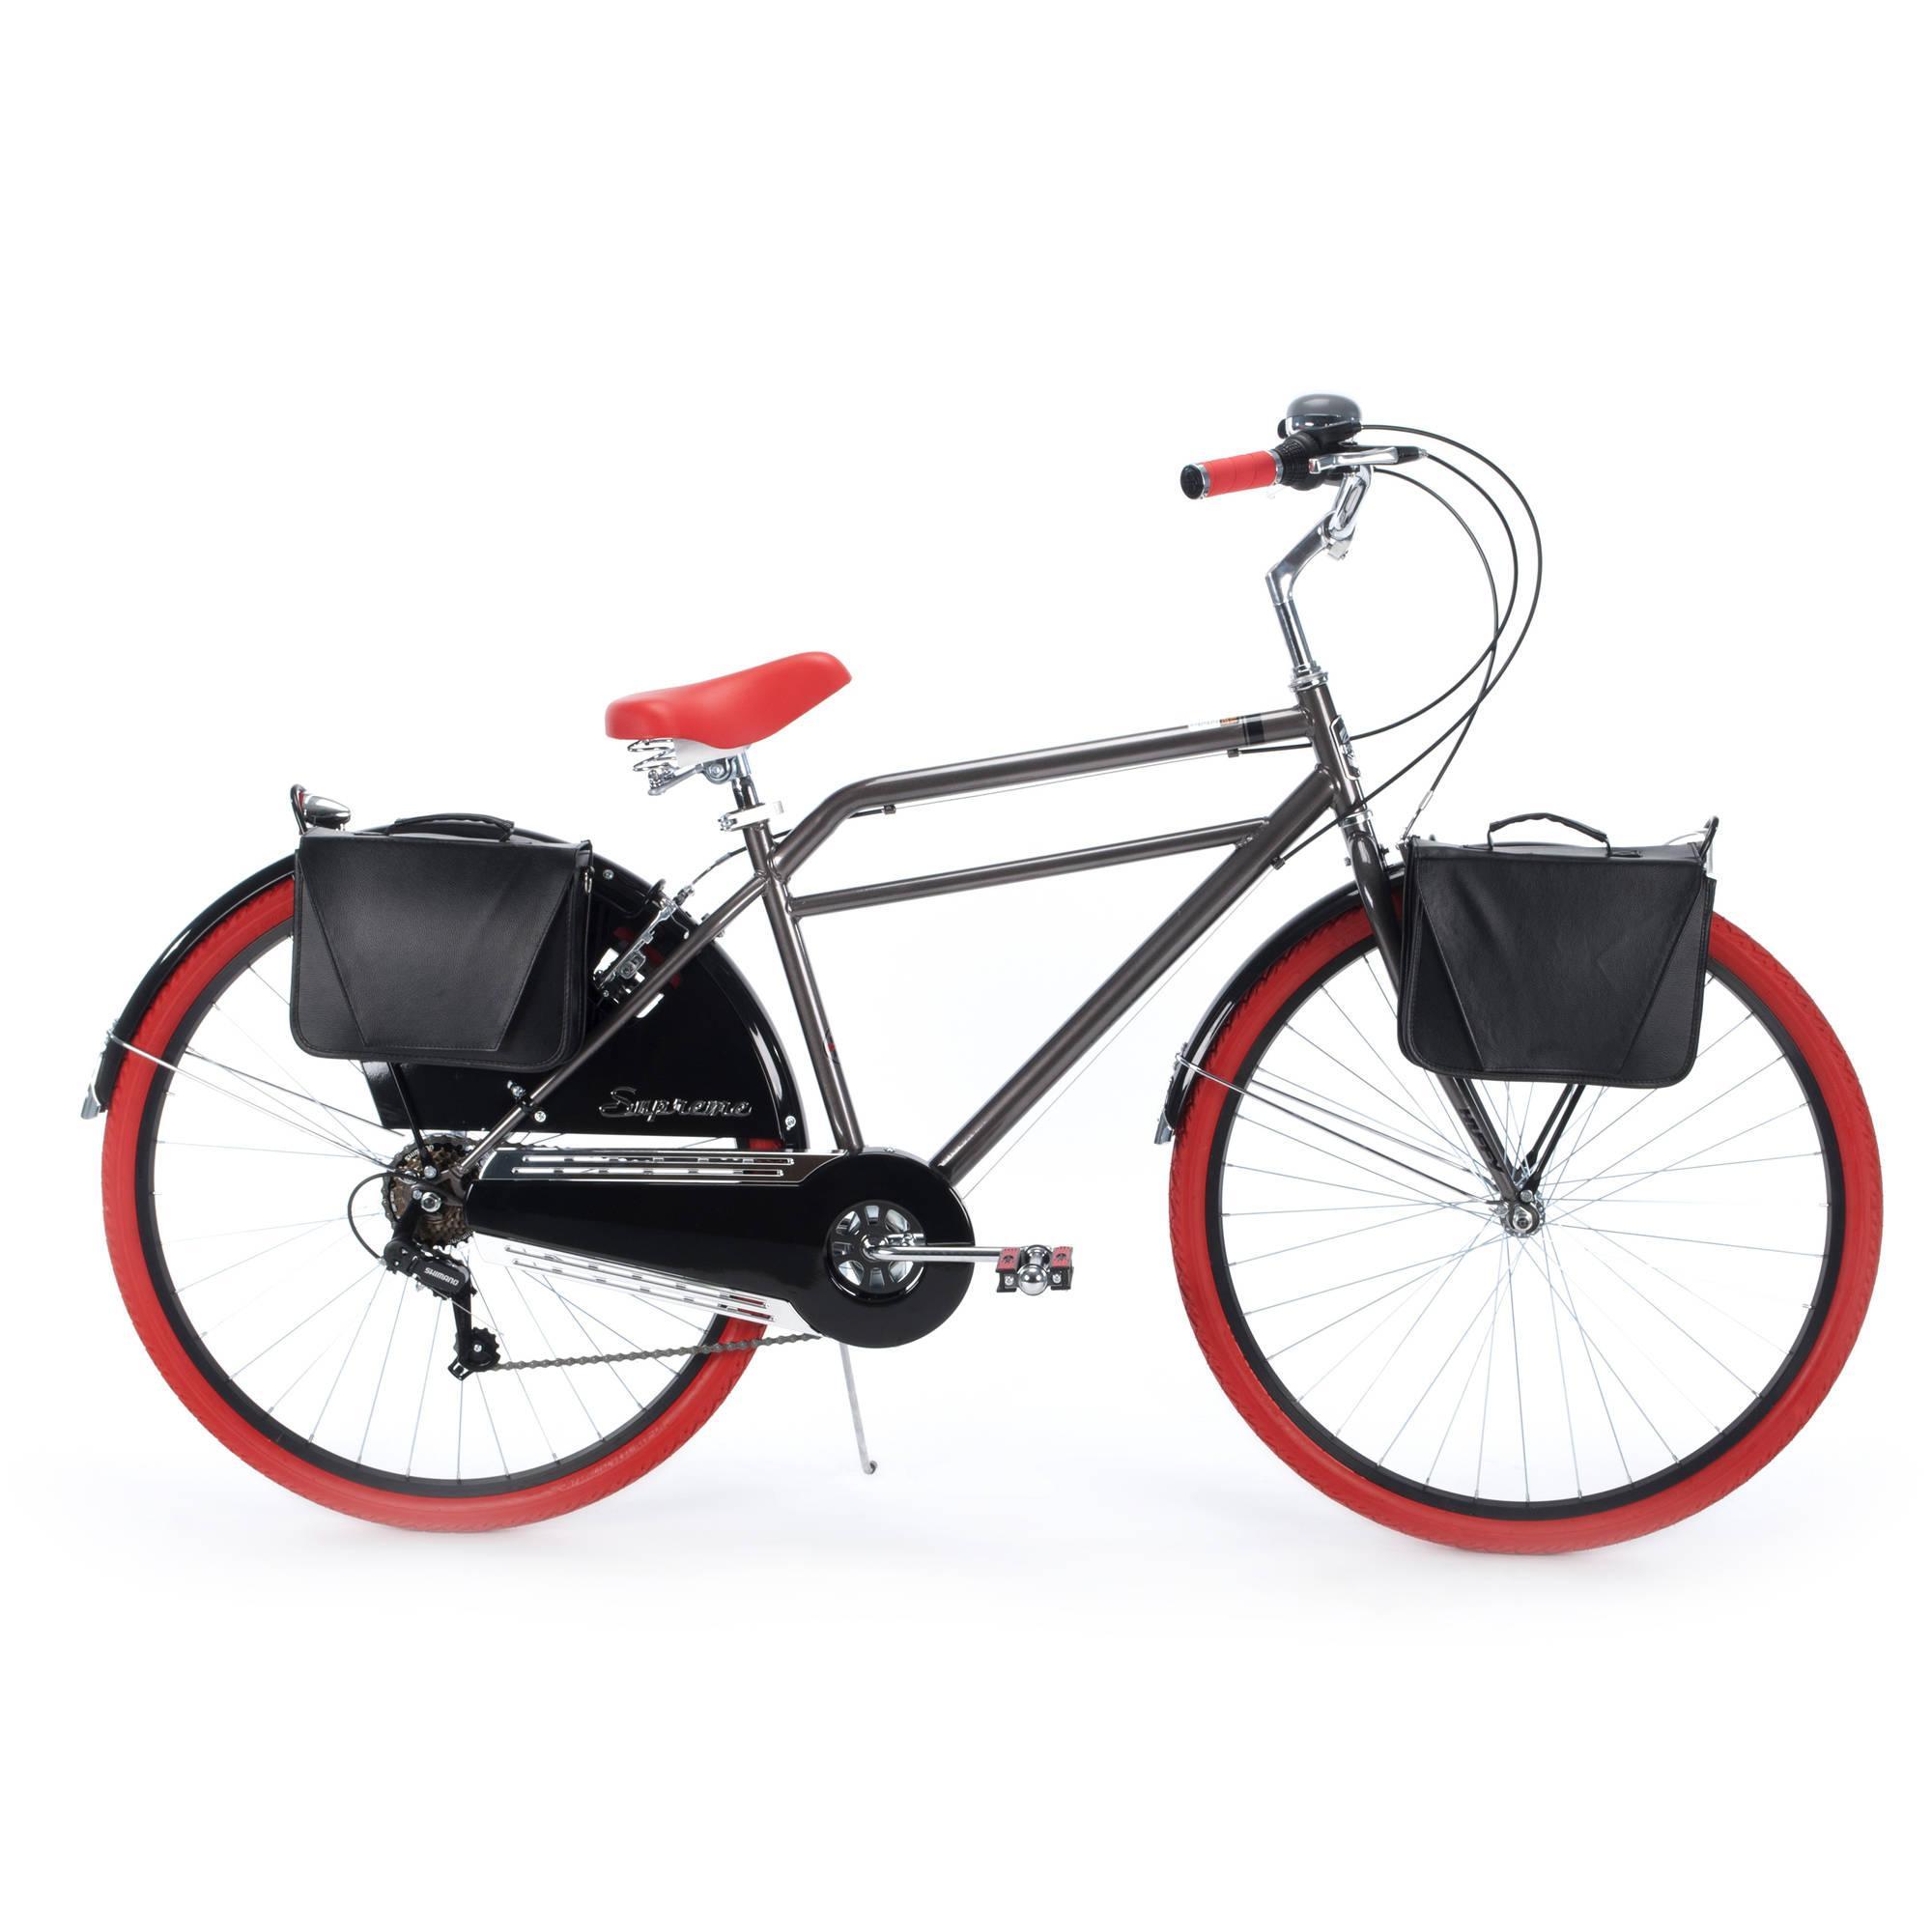 Huffy 700c Supreme Men's Cruiser Bike  $79 + Free Shipping